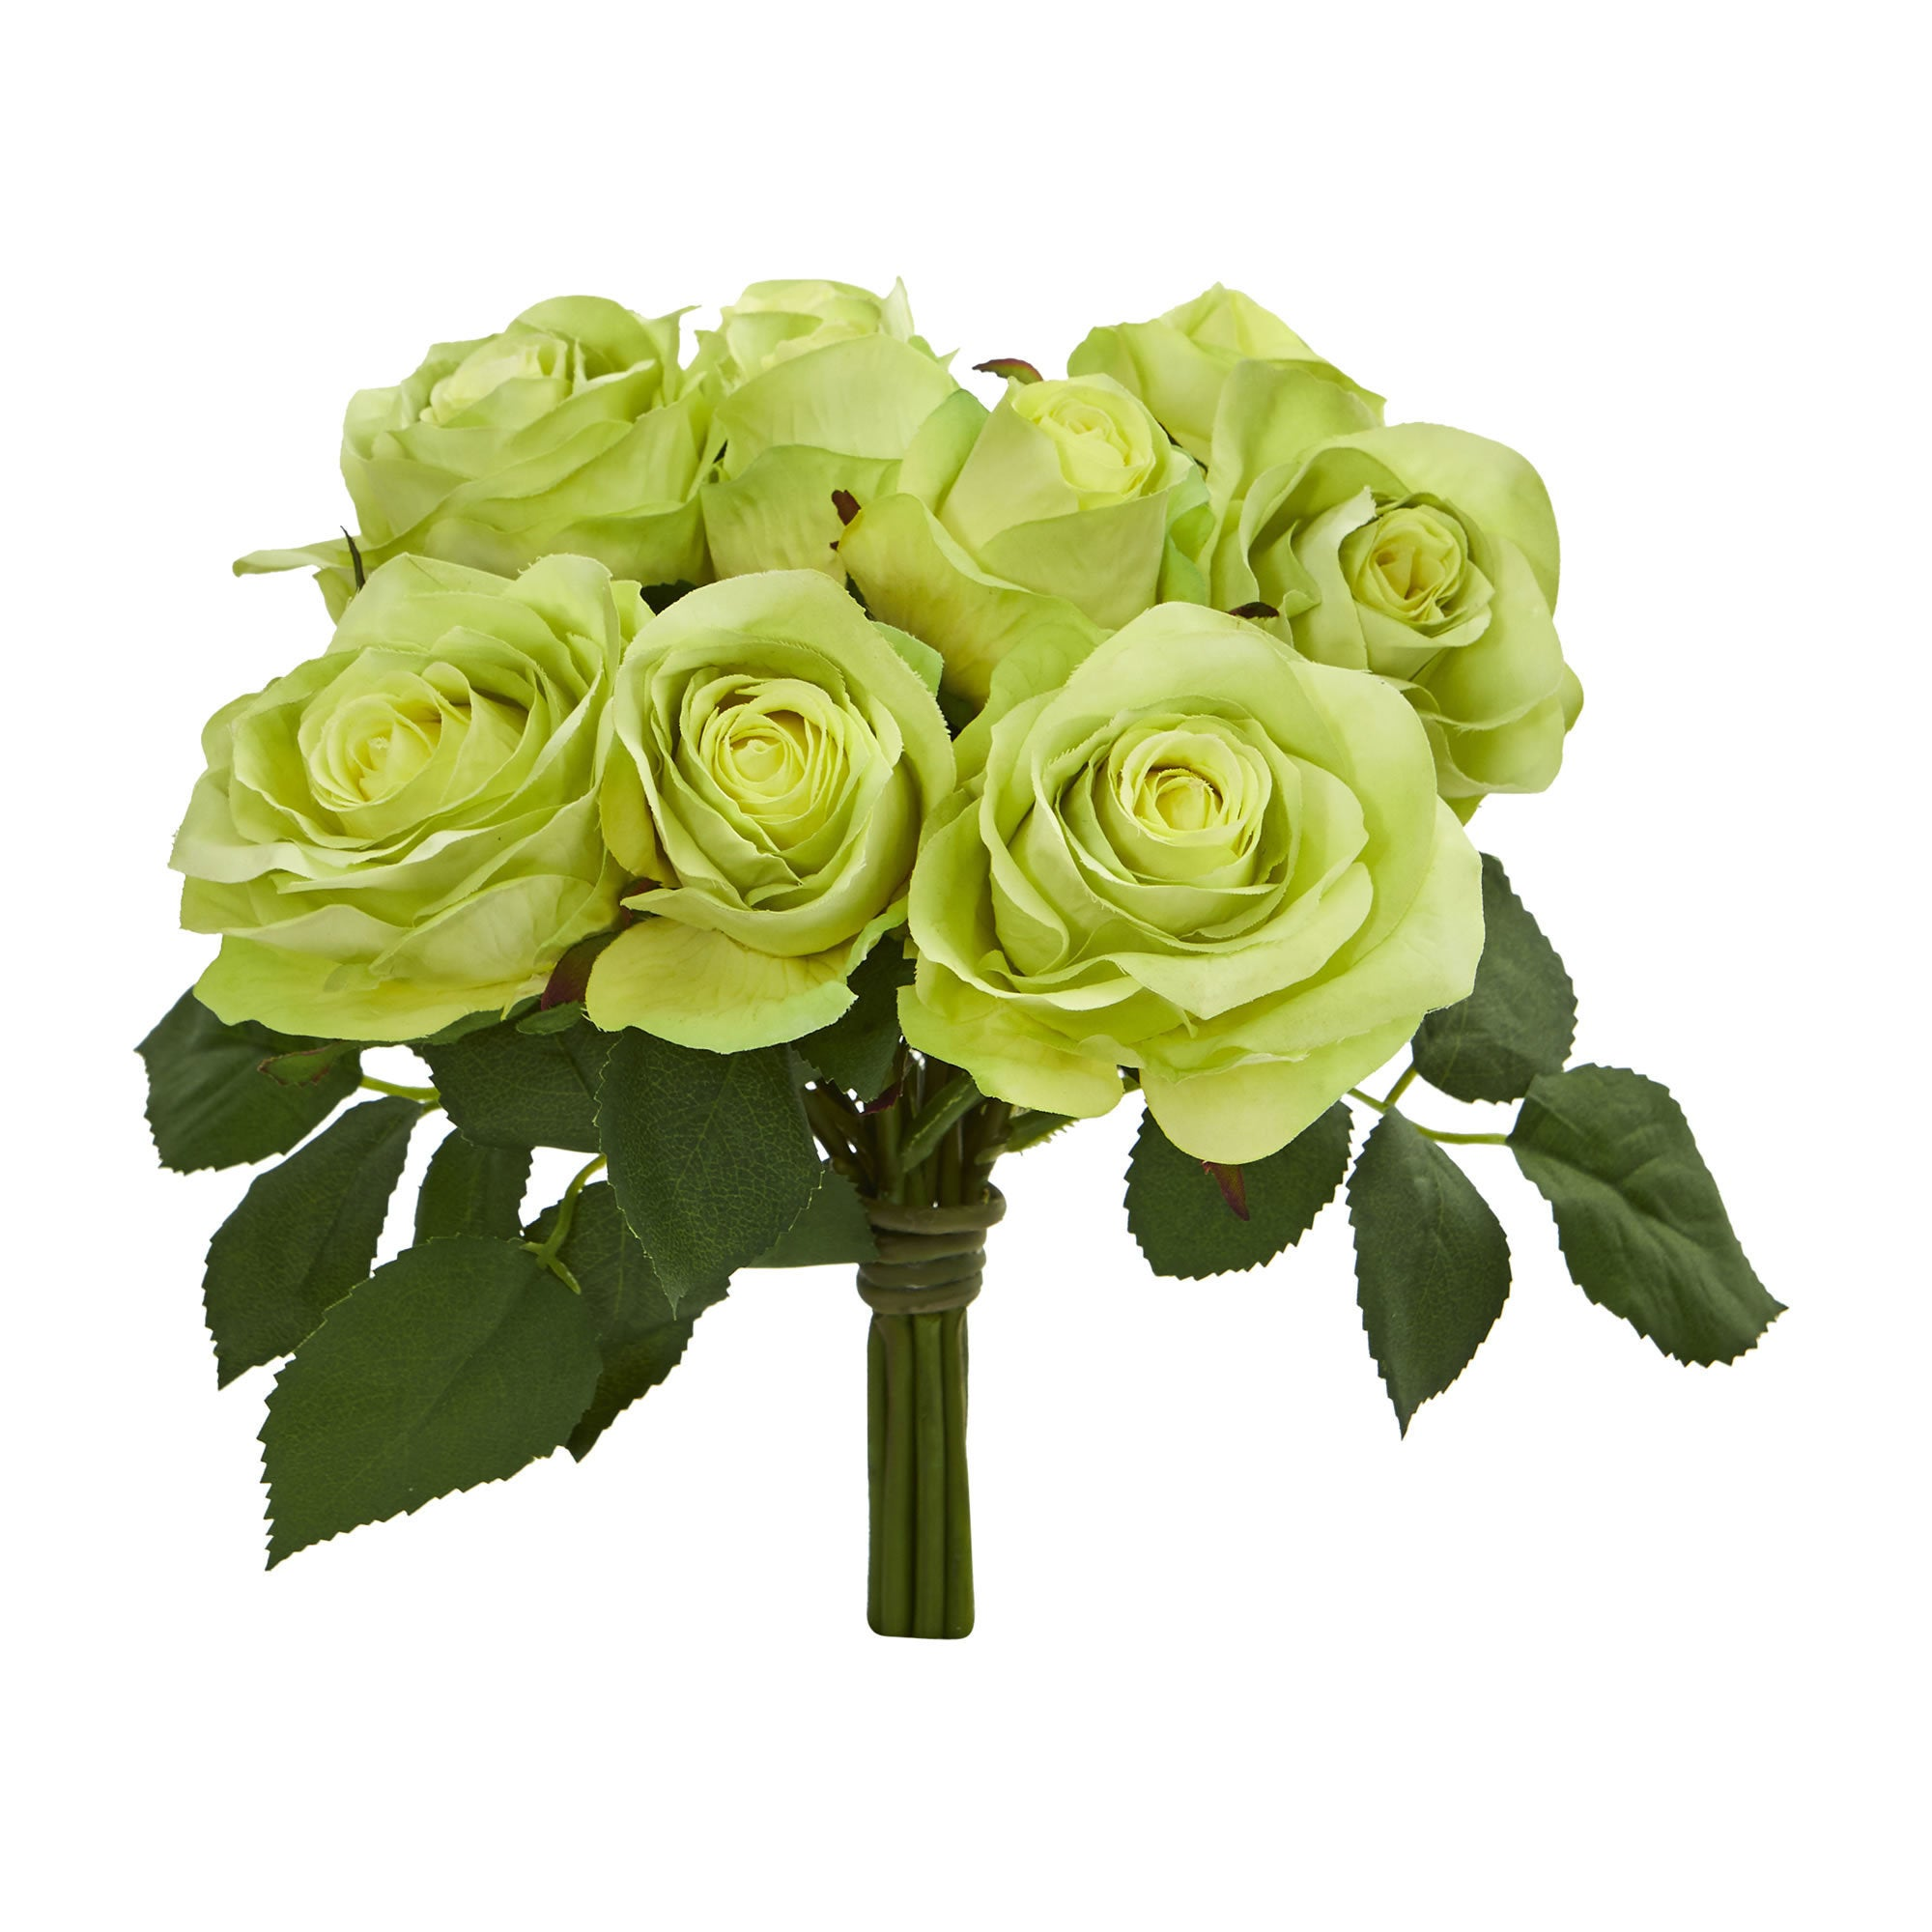 Rose Bush Artificial Flower Set Of 2 Overstock 18688792